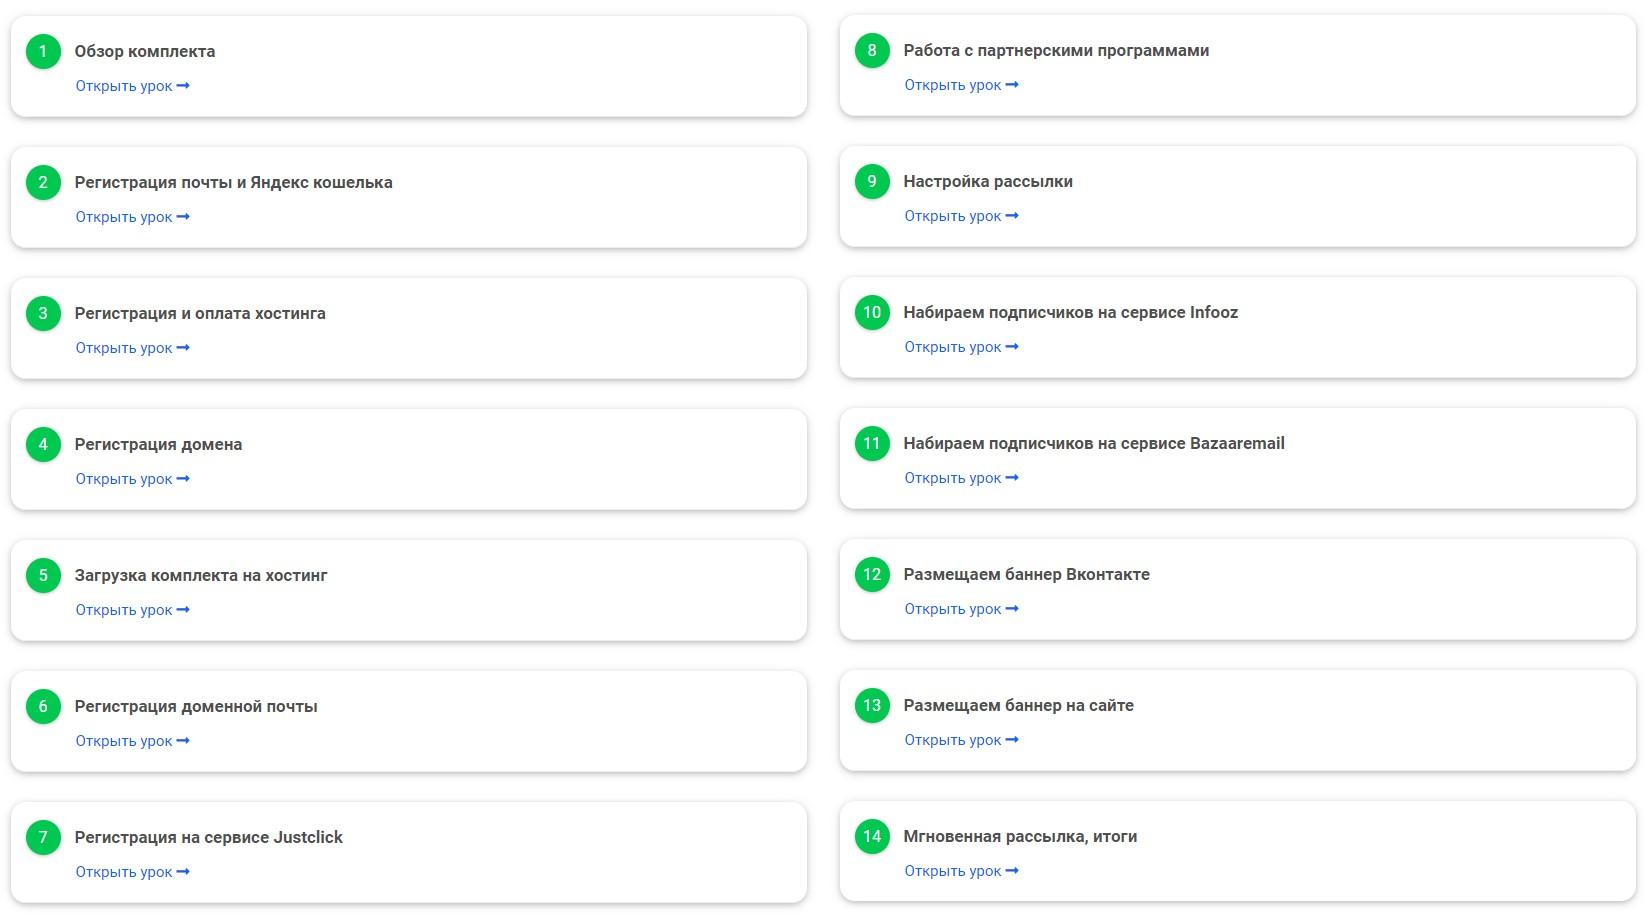 Система Капитал, курс Капитал, Максим Зеленцов